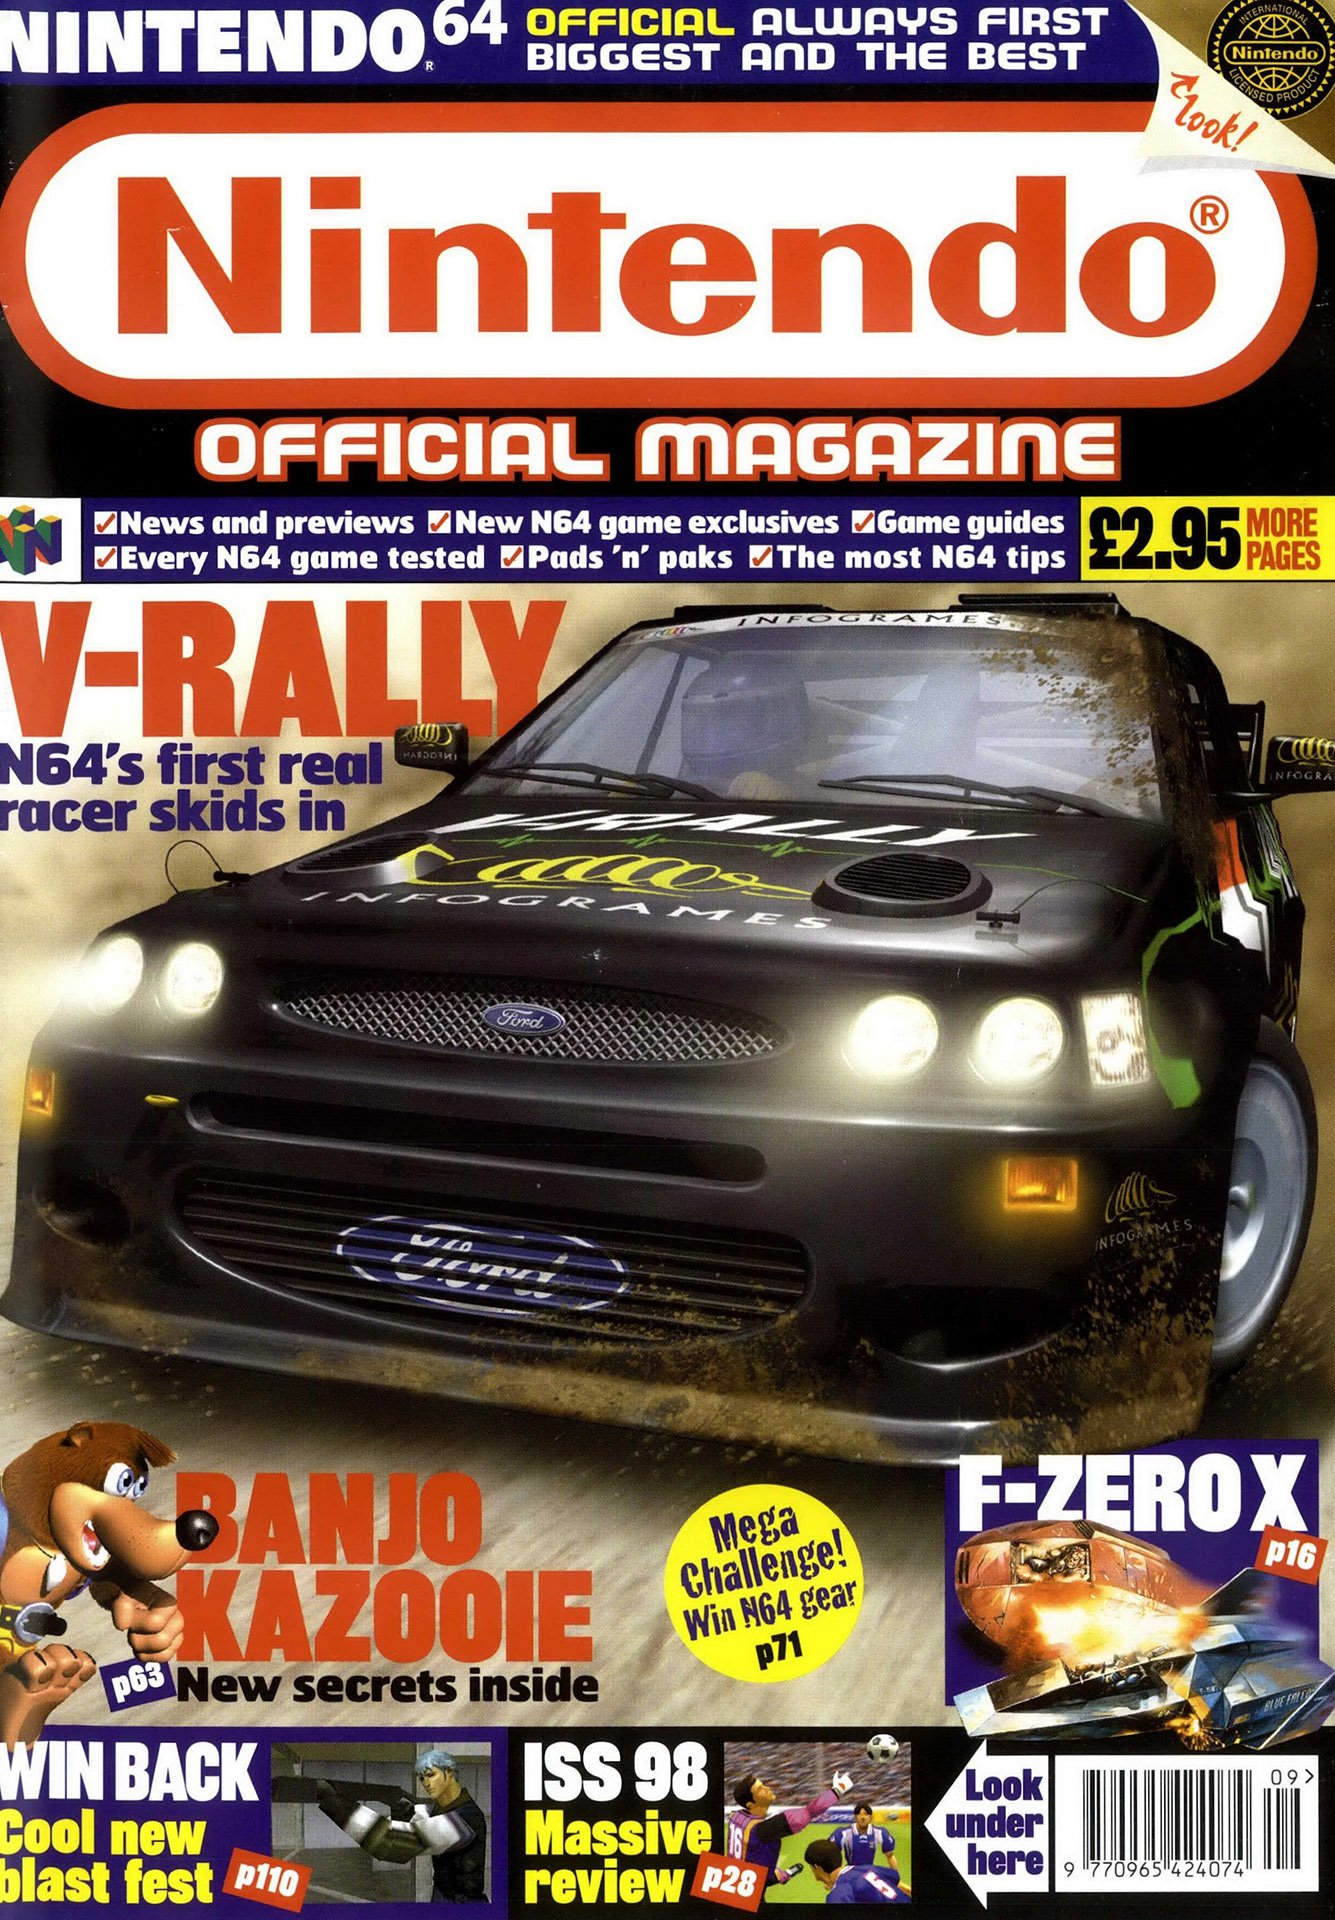 Nintendo Official Magazine 072 (September 1998)